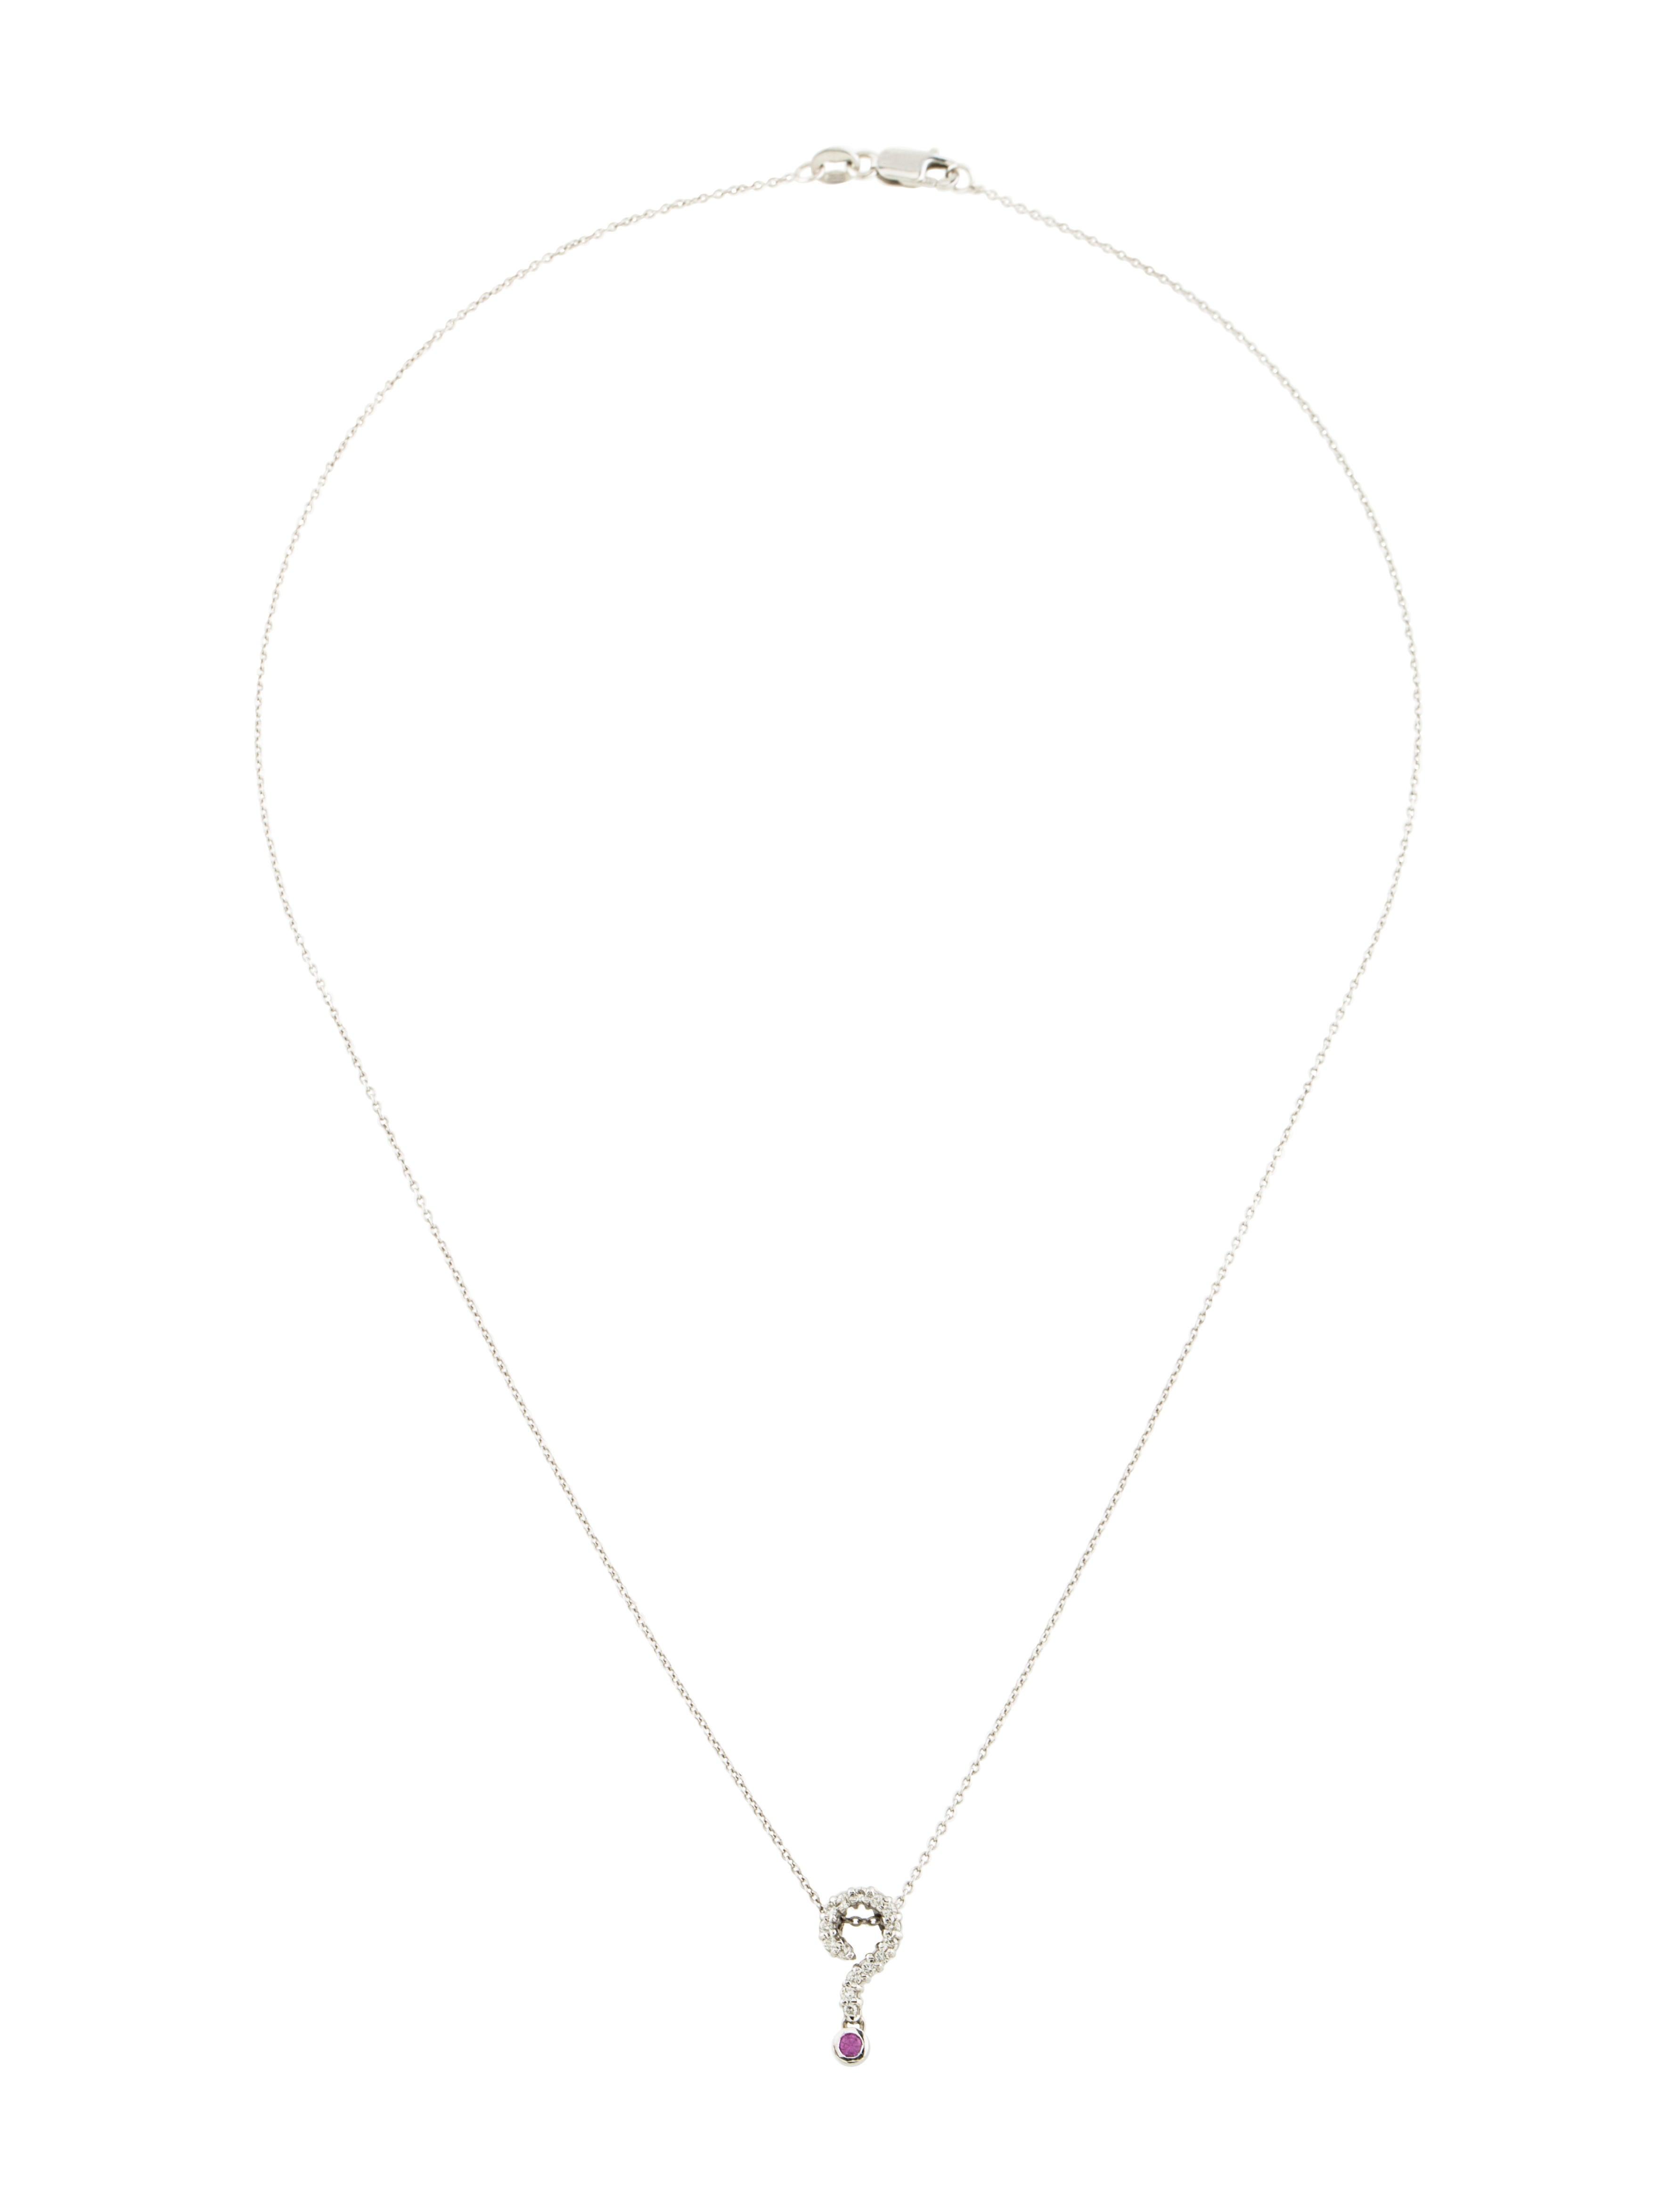 Roberto coin 18k diamond pink sapphire question mark necklace 18k diamond pink sapphire question mark necklace aloadofball Choice Image